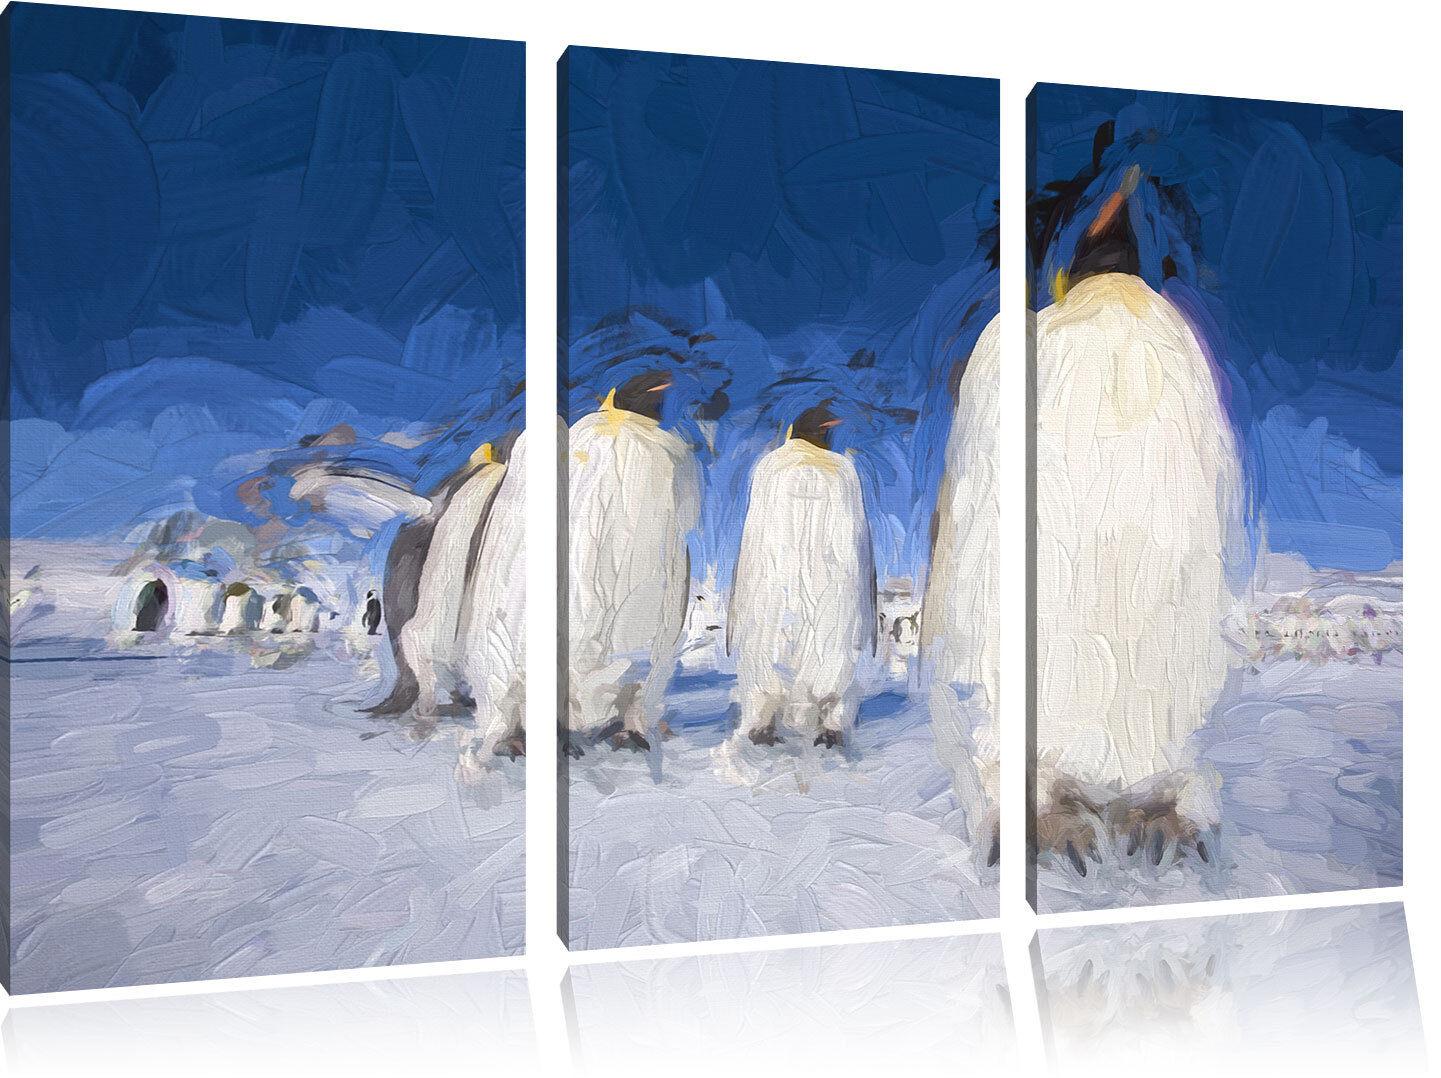 Kaiserpiguine in Antarktis Kunst Pinsel Effekt 3-Teiler Leinwandbild Wanddeko Ku